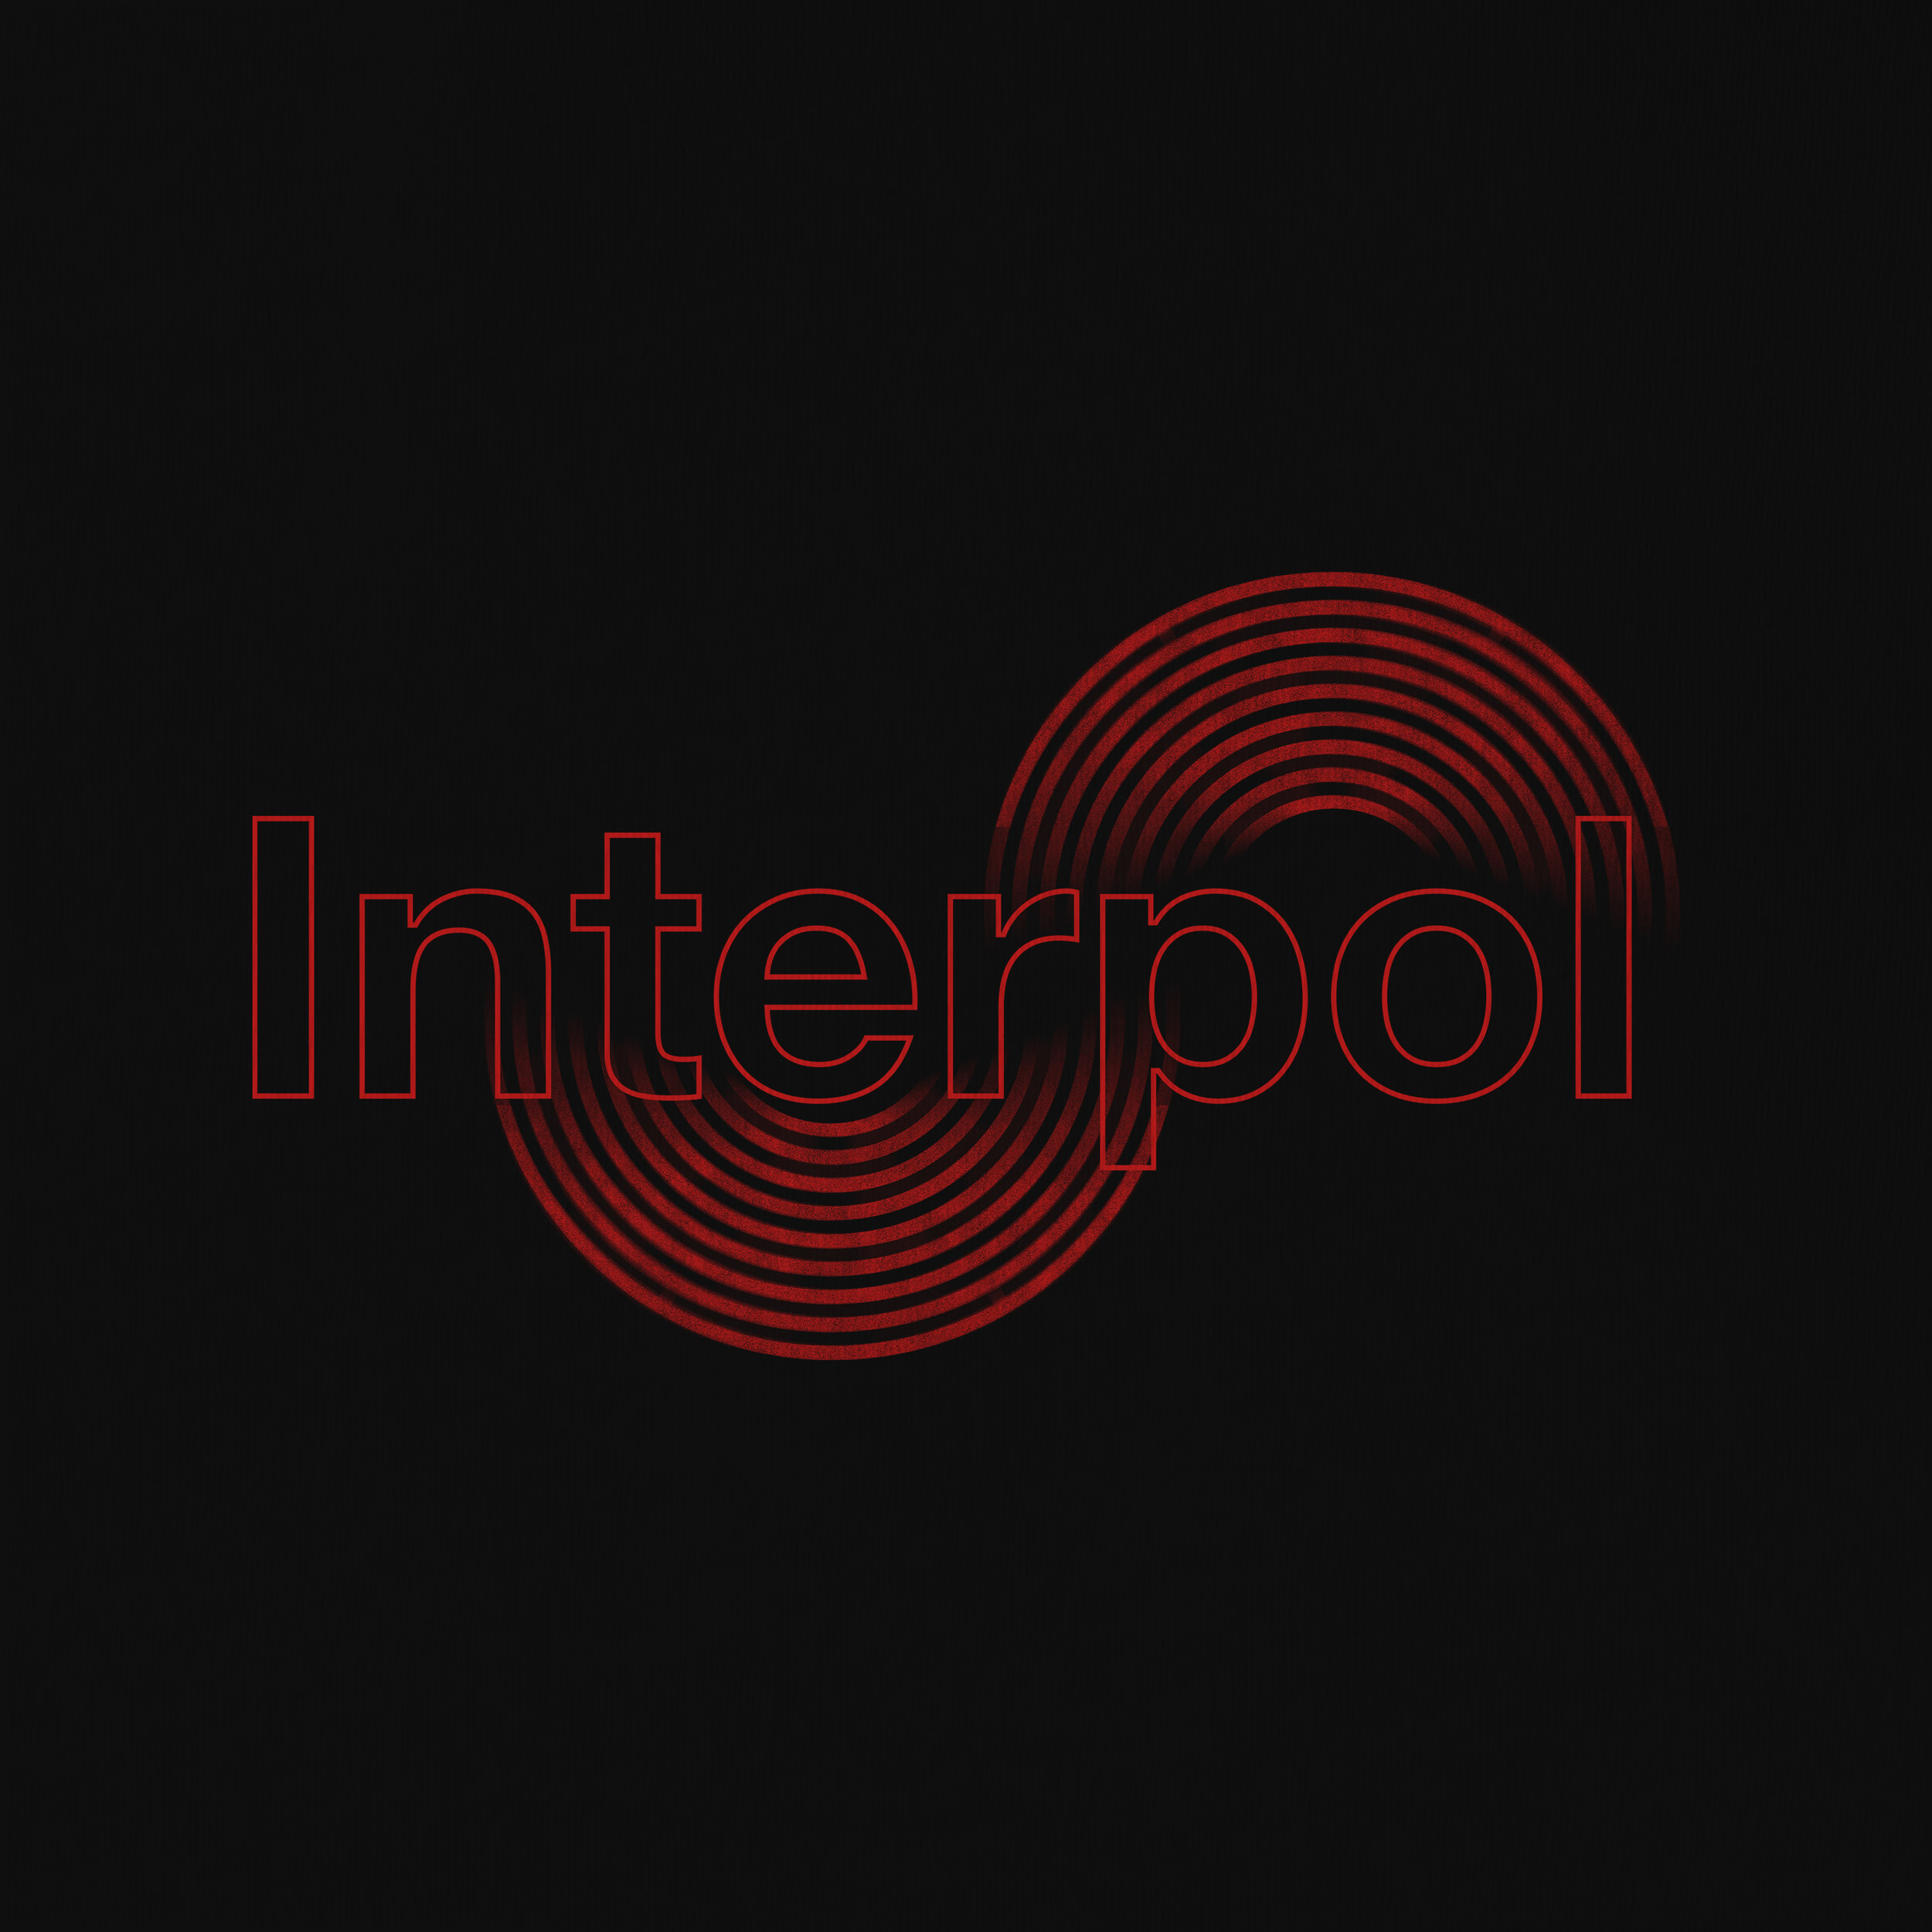 interpol-circles.jpg